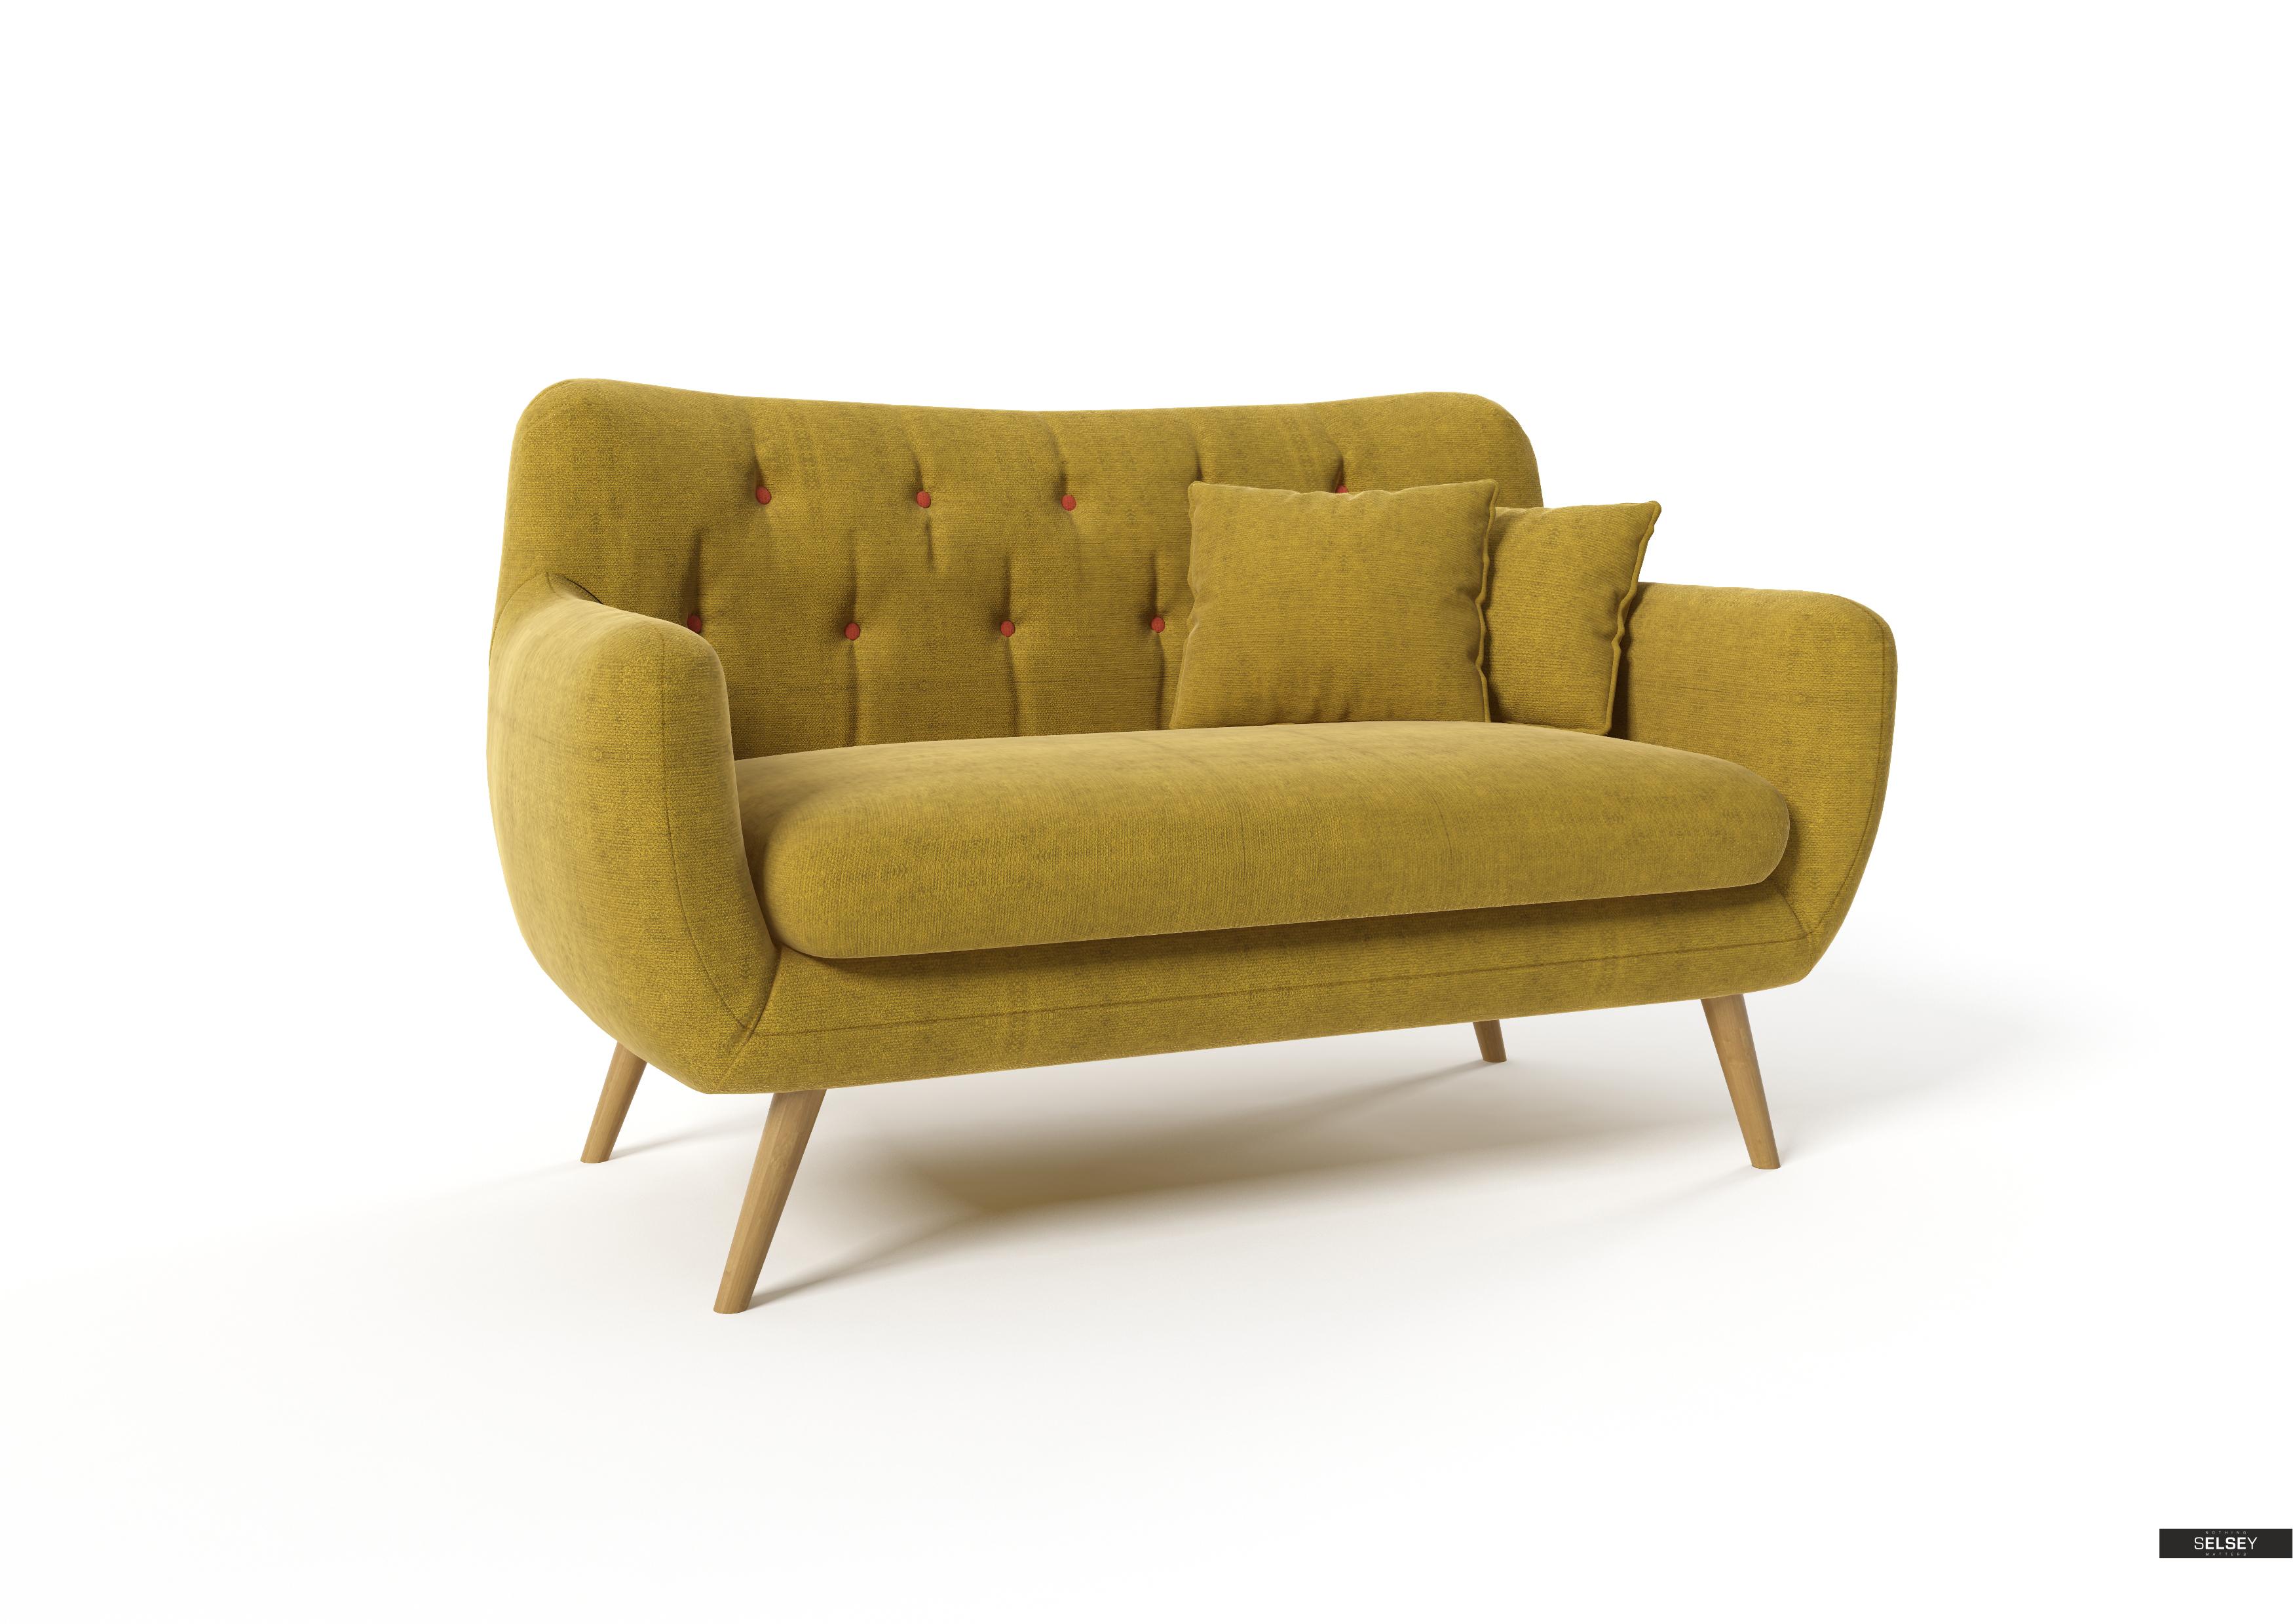 sofa royal 2 sitz. Black Bedroom Furniture Sets. Home Design Ideas